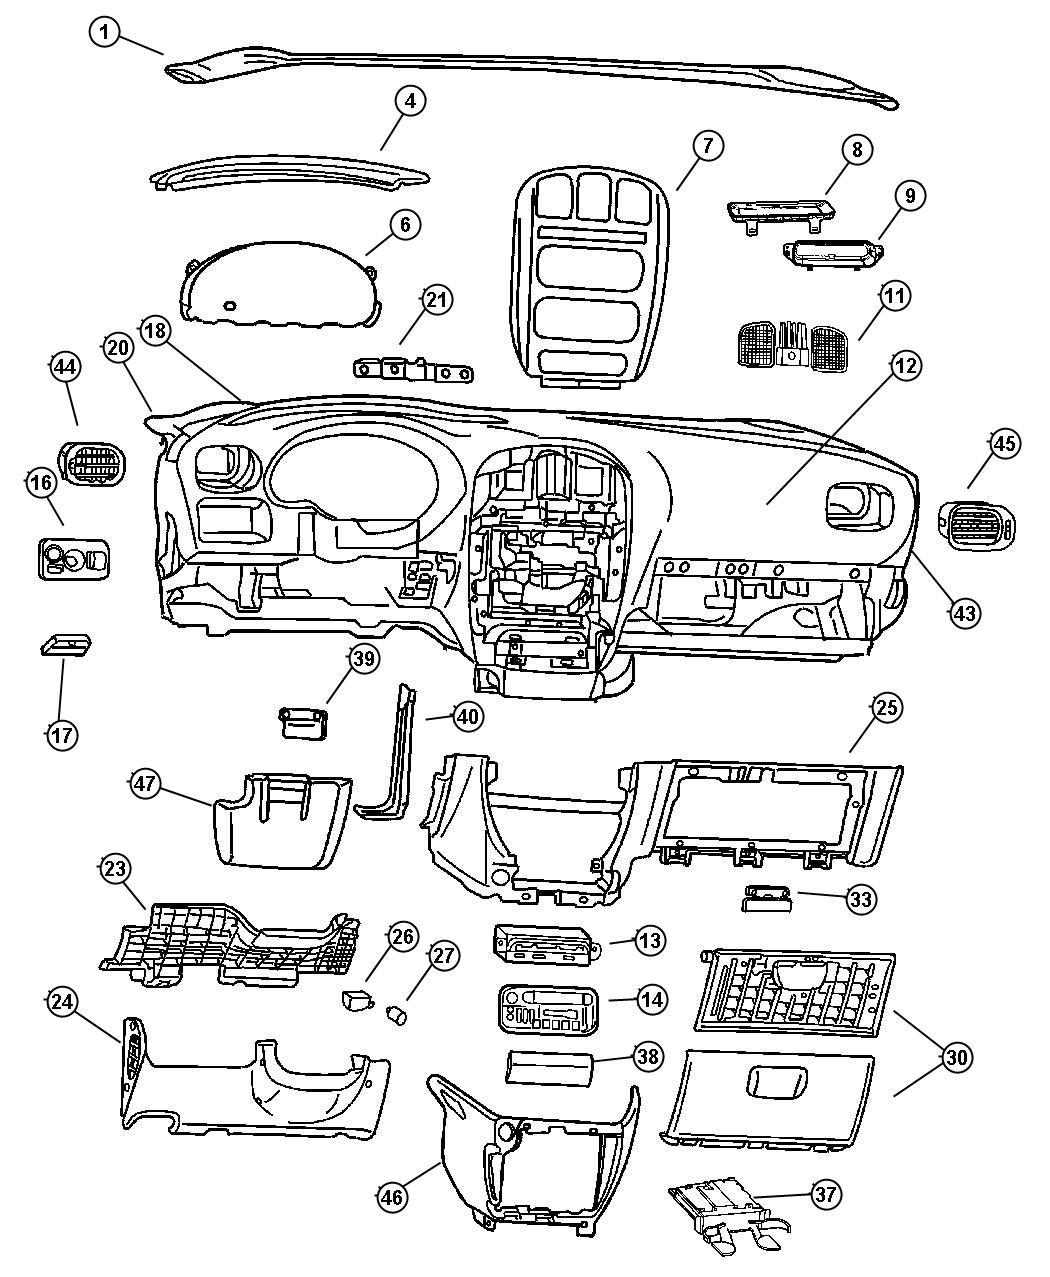 1999 Dodge Ram 1500 Dashboard Replacement